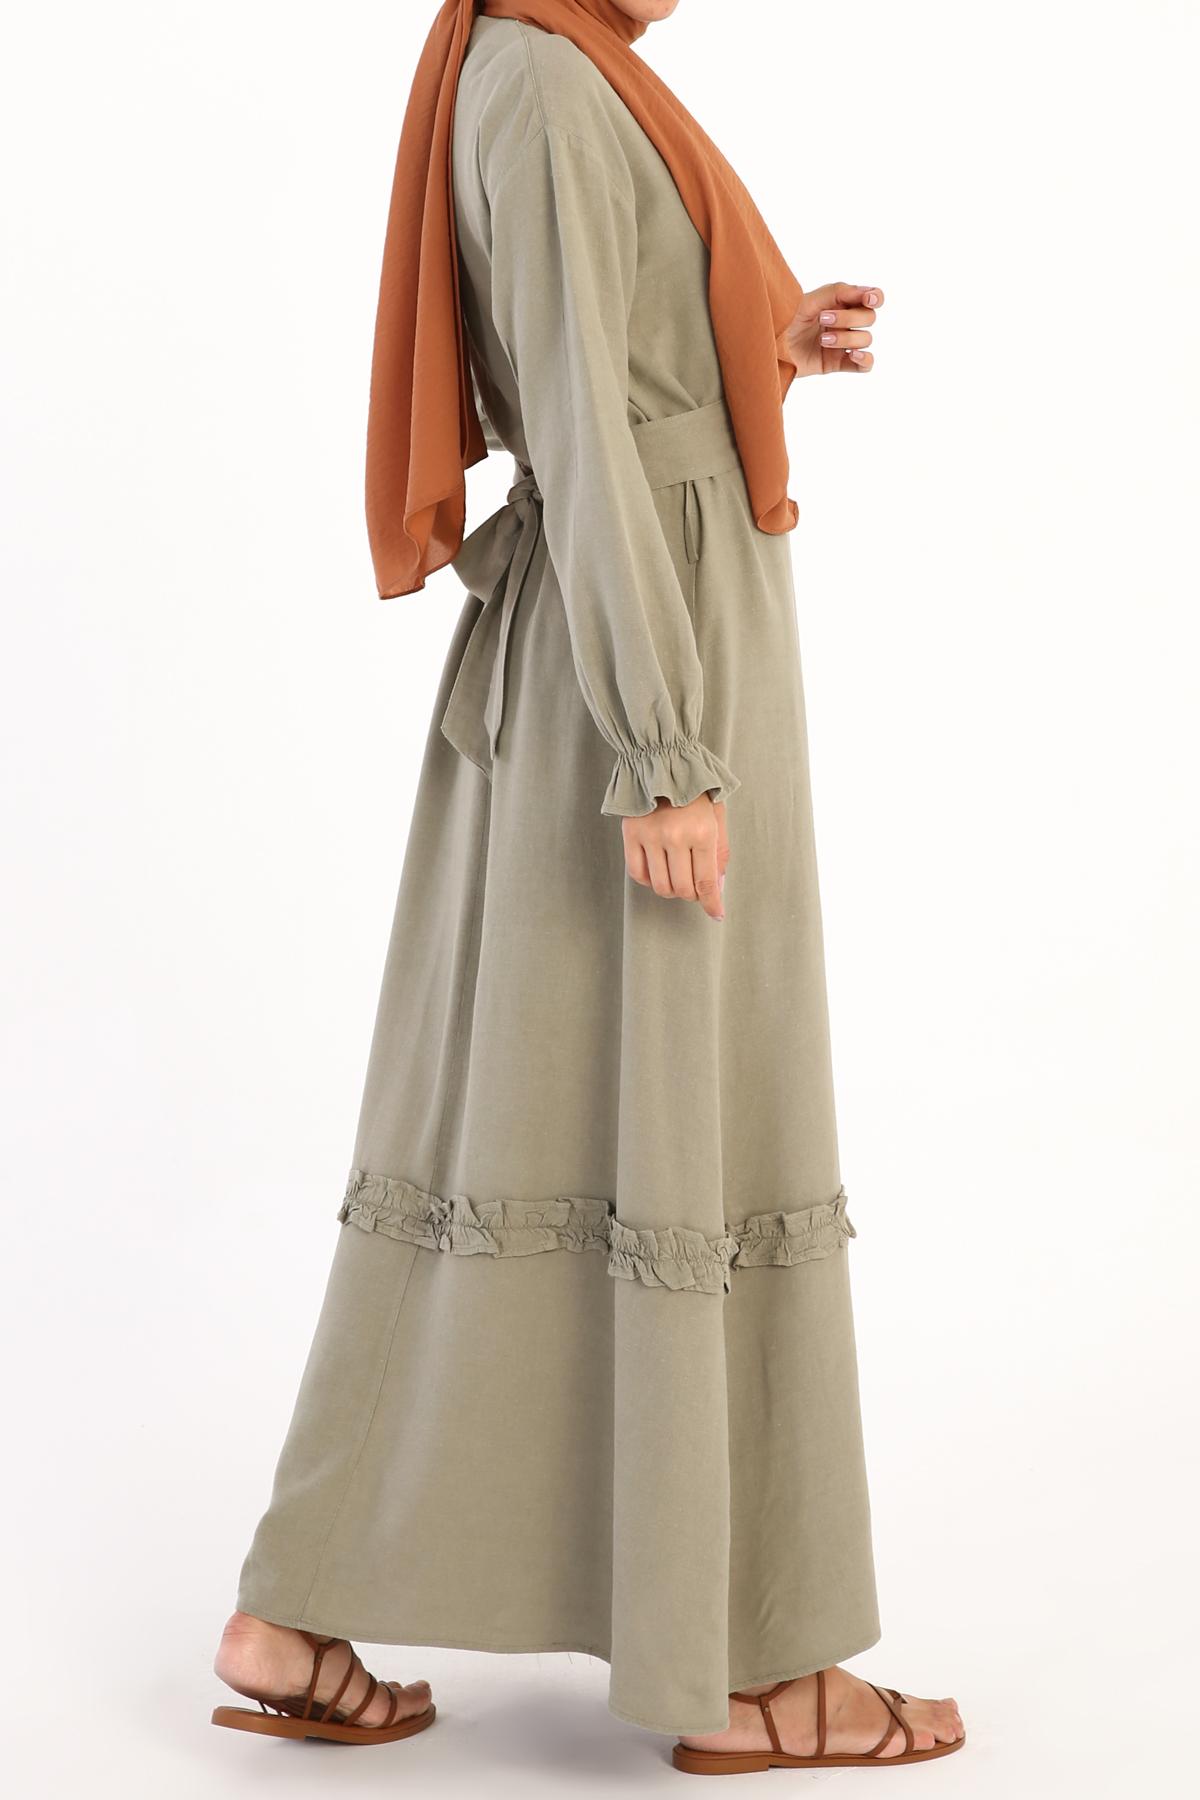 Self Belted Ruffle Juliet Sleeve Long Dress